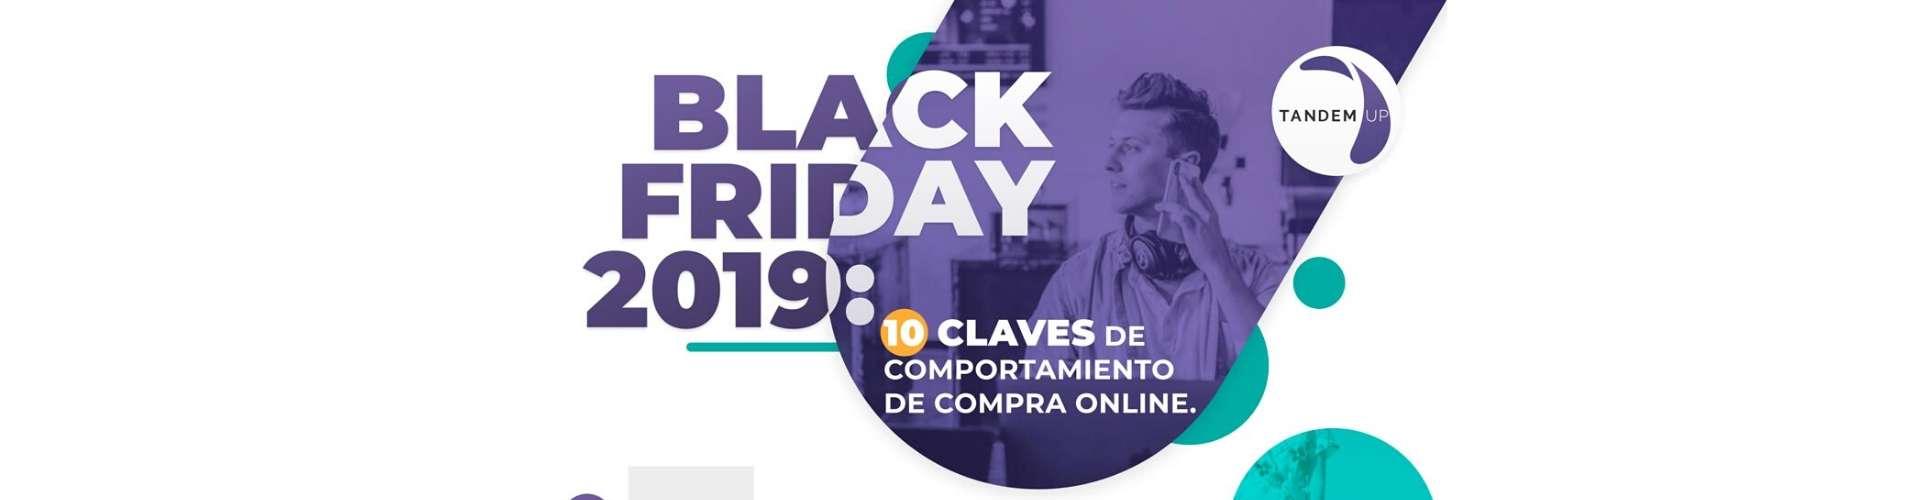 Estudio Black Friday 2019